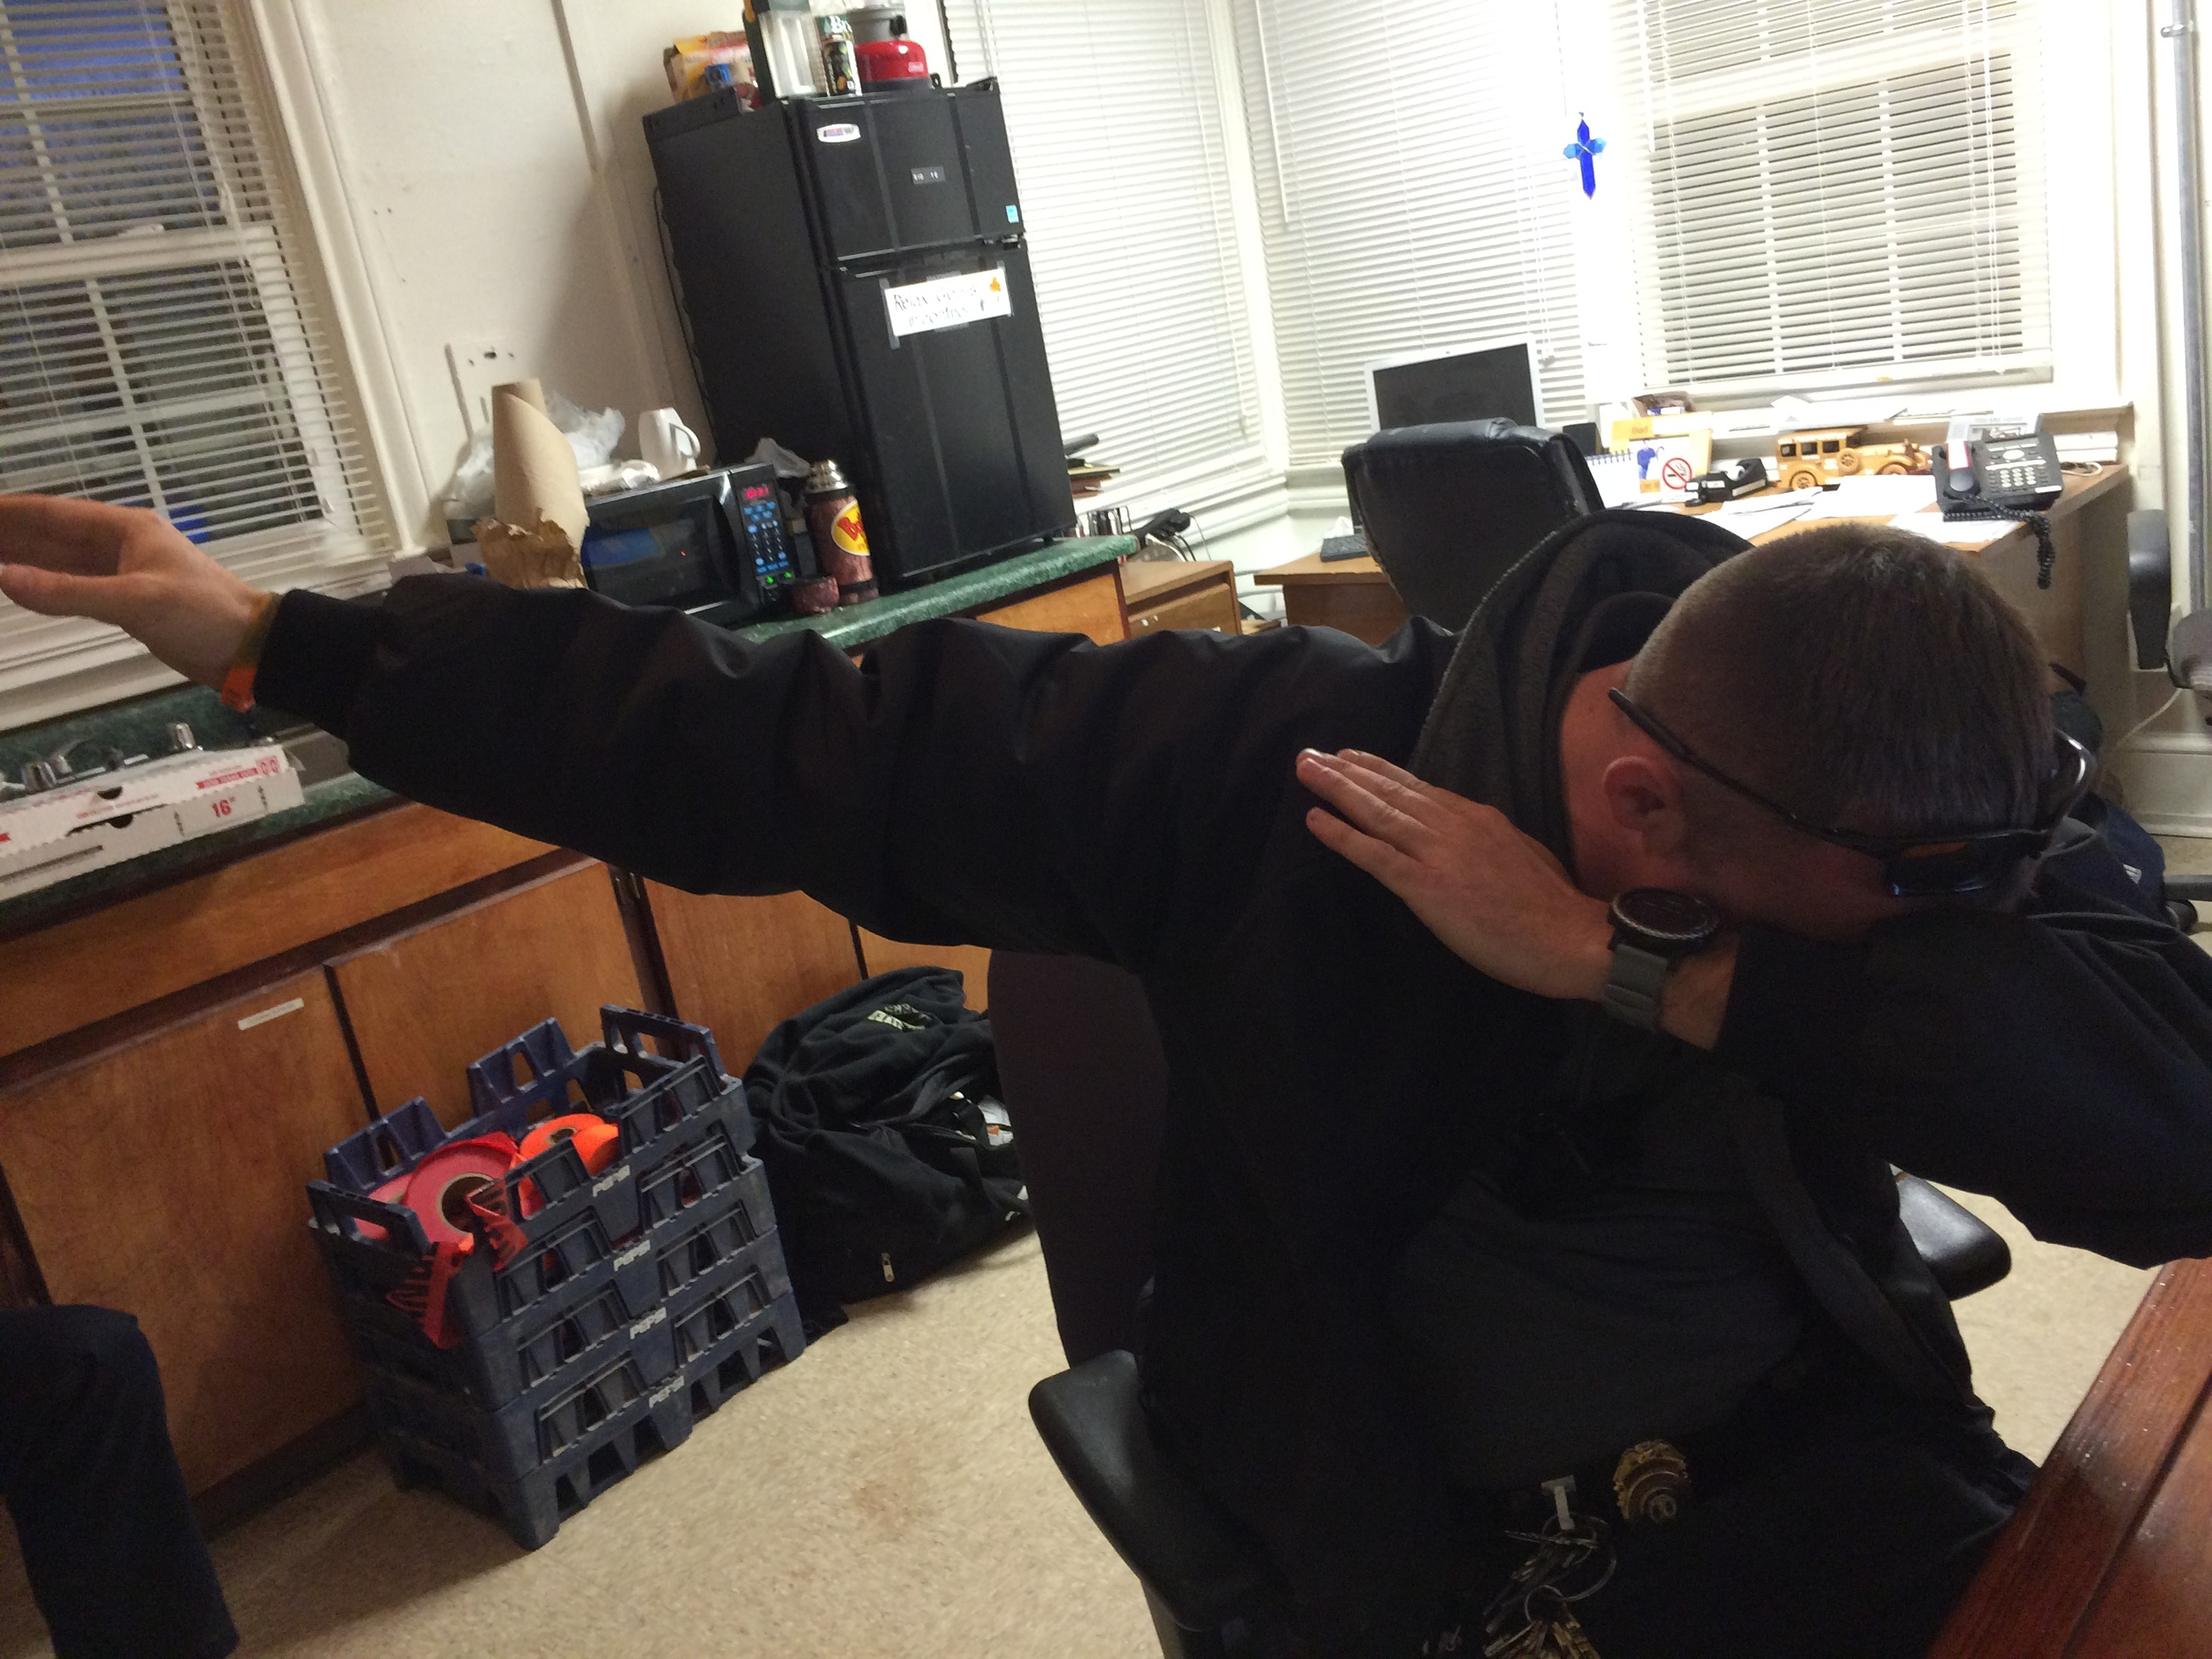 Corporal Wayne Craft poses the dab